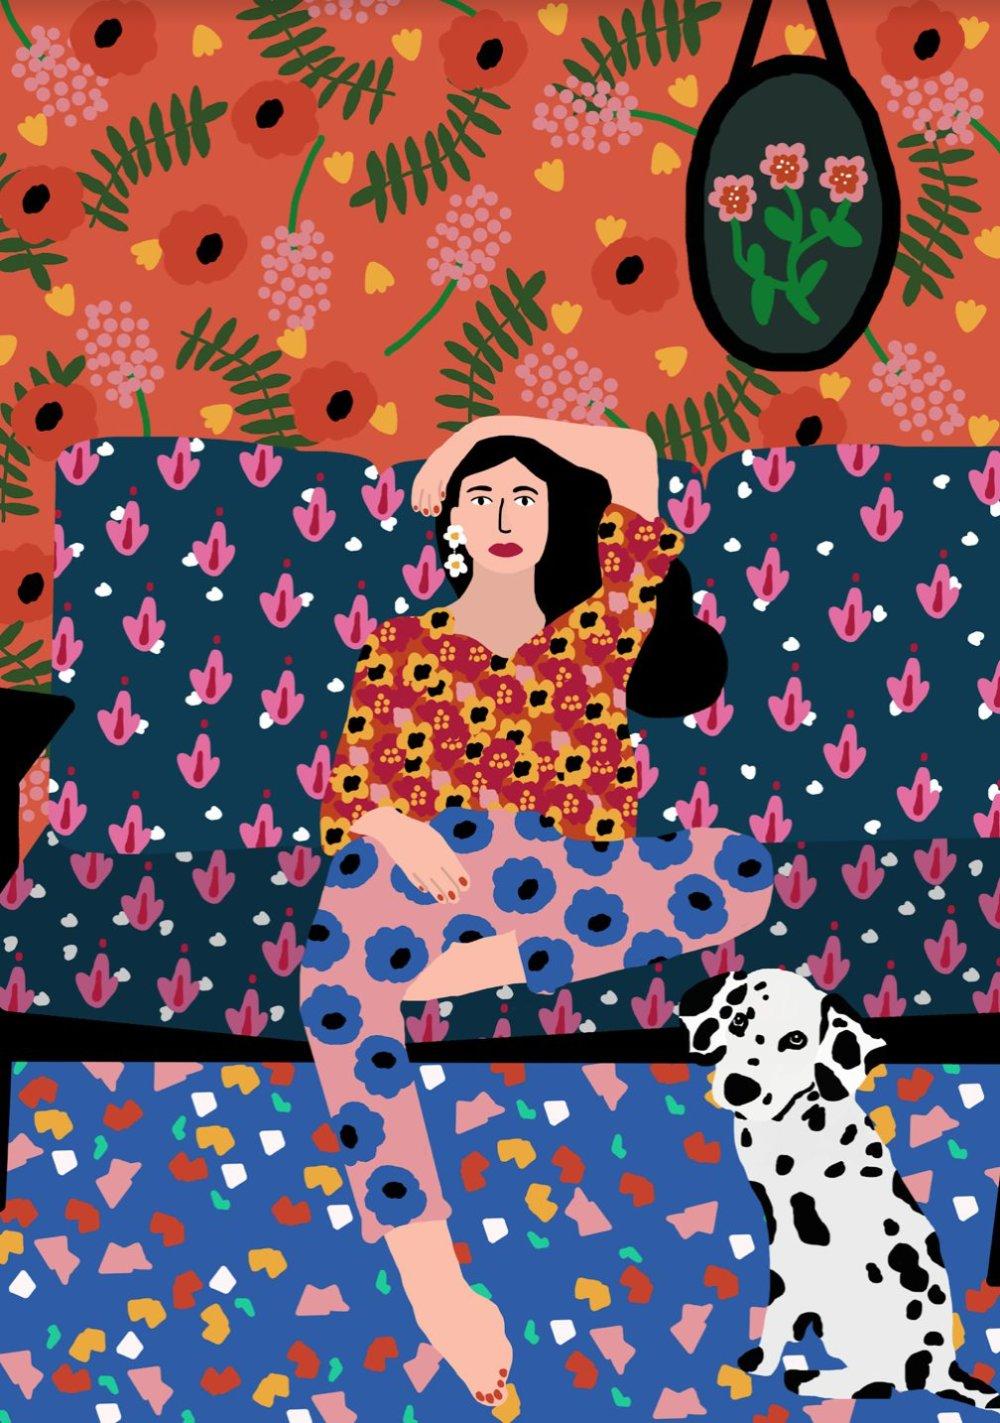 Gorgeous And Colorful Floral Illustrations By Rafaela Mascaro 1